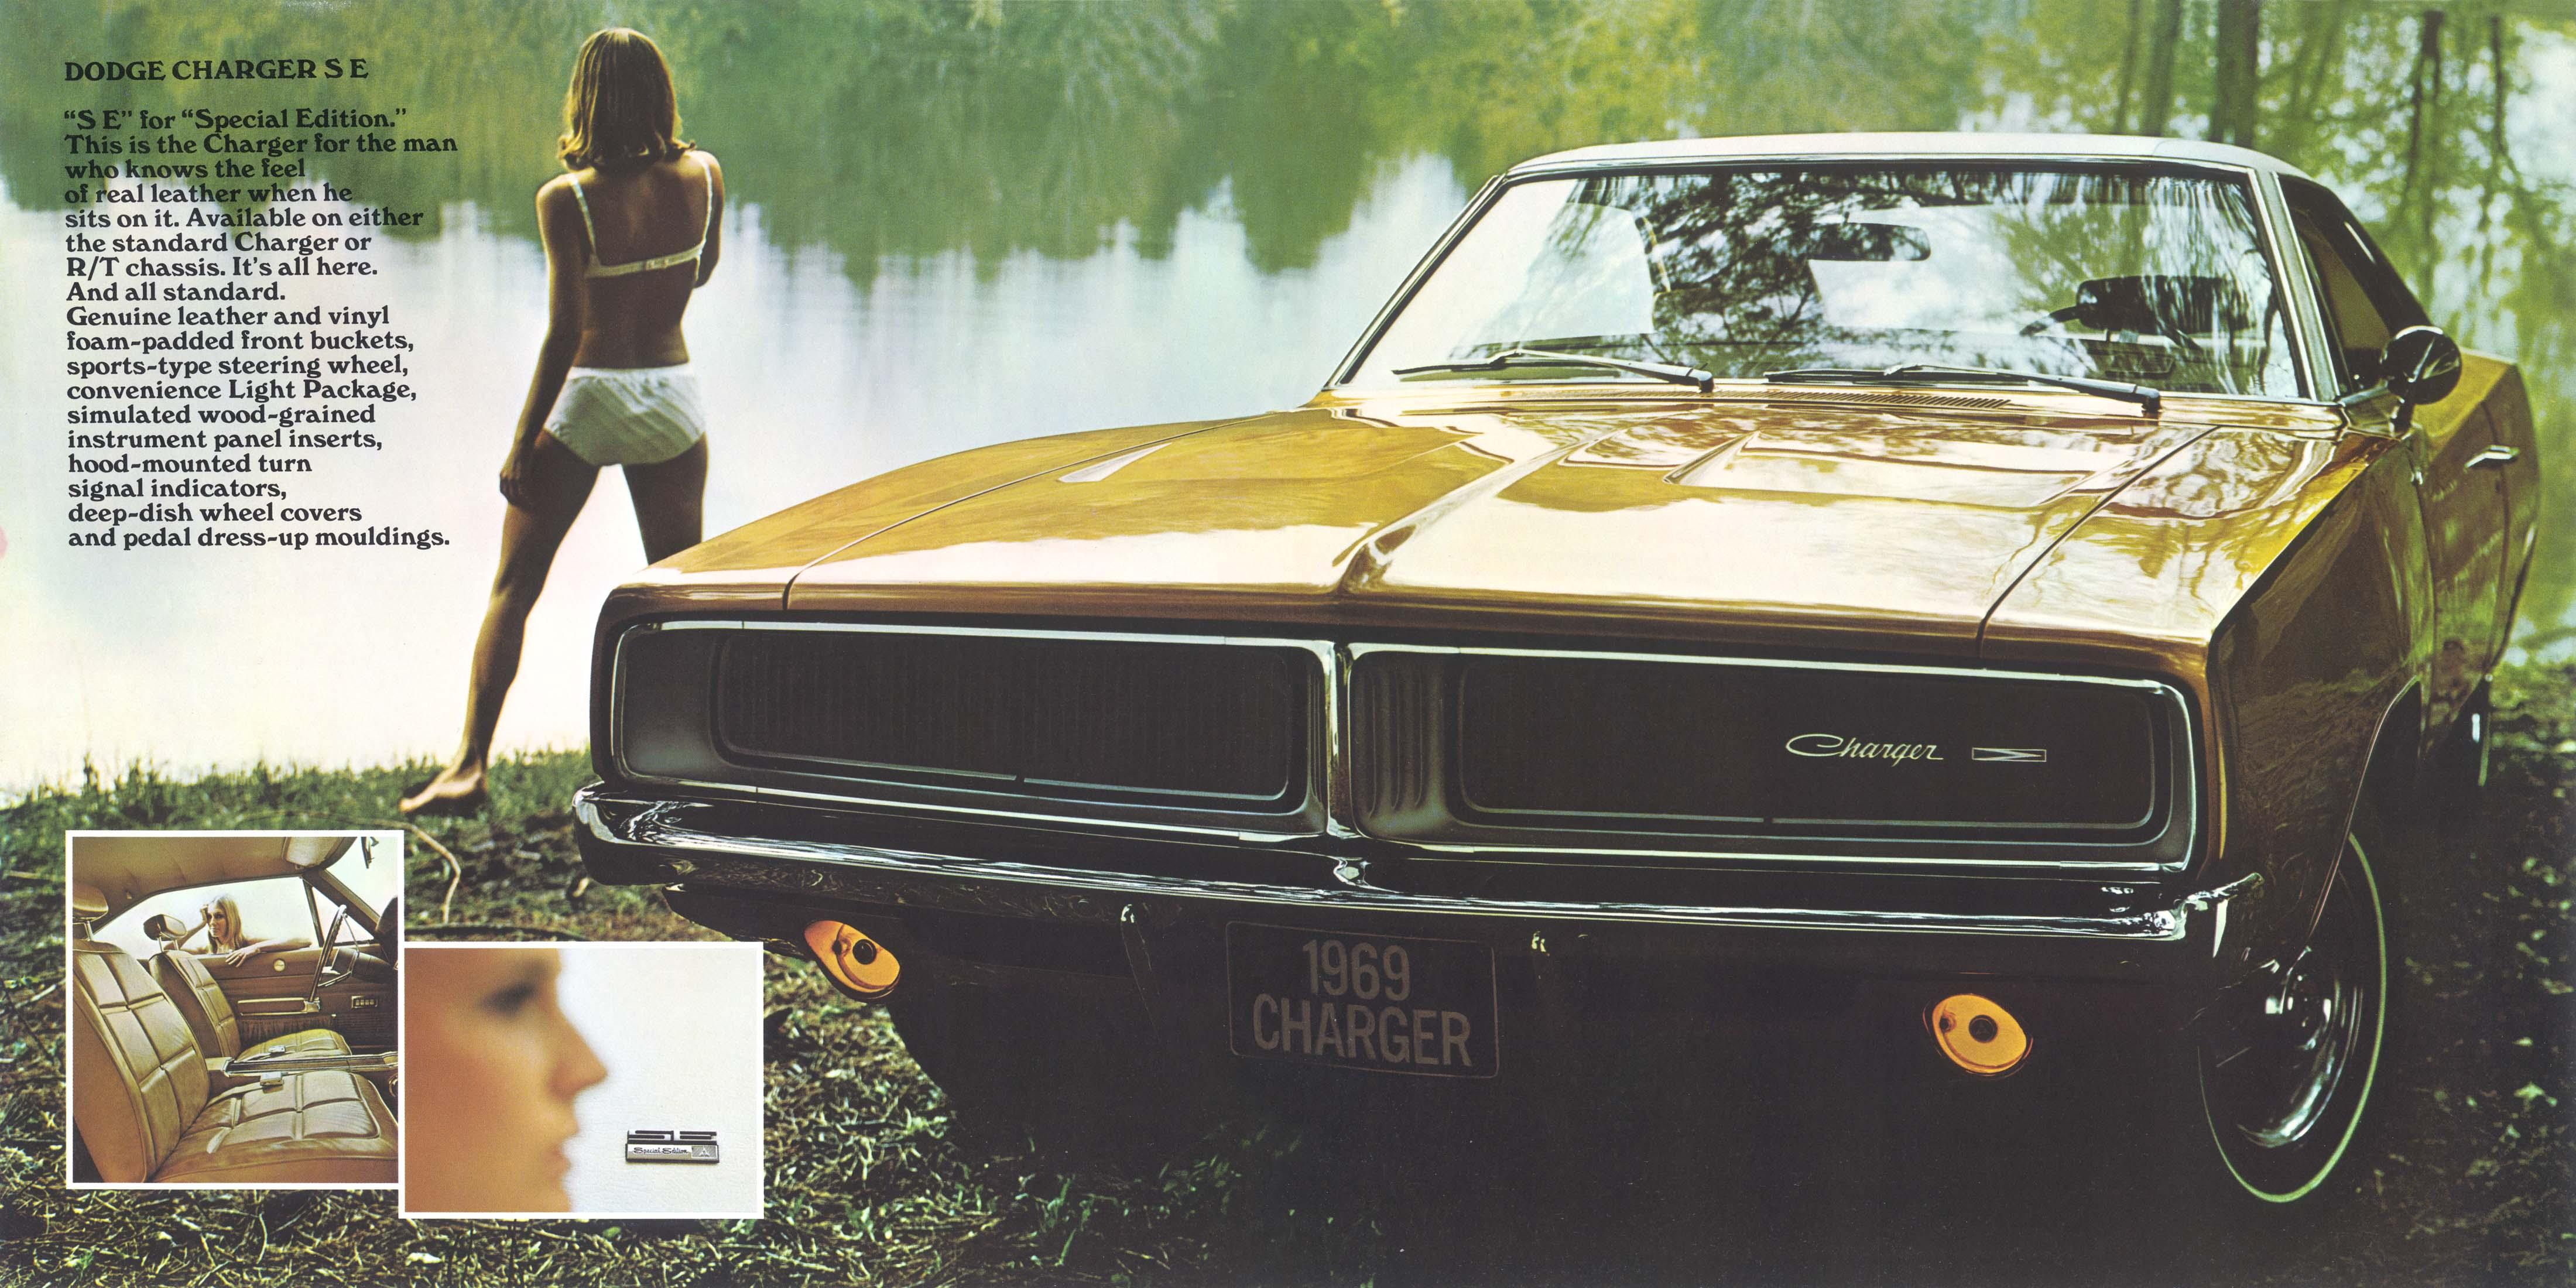 1969 Dodge Charger Brochure